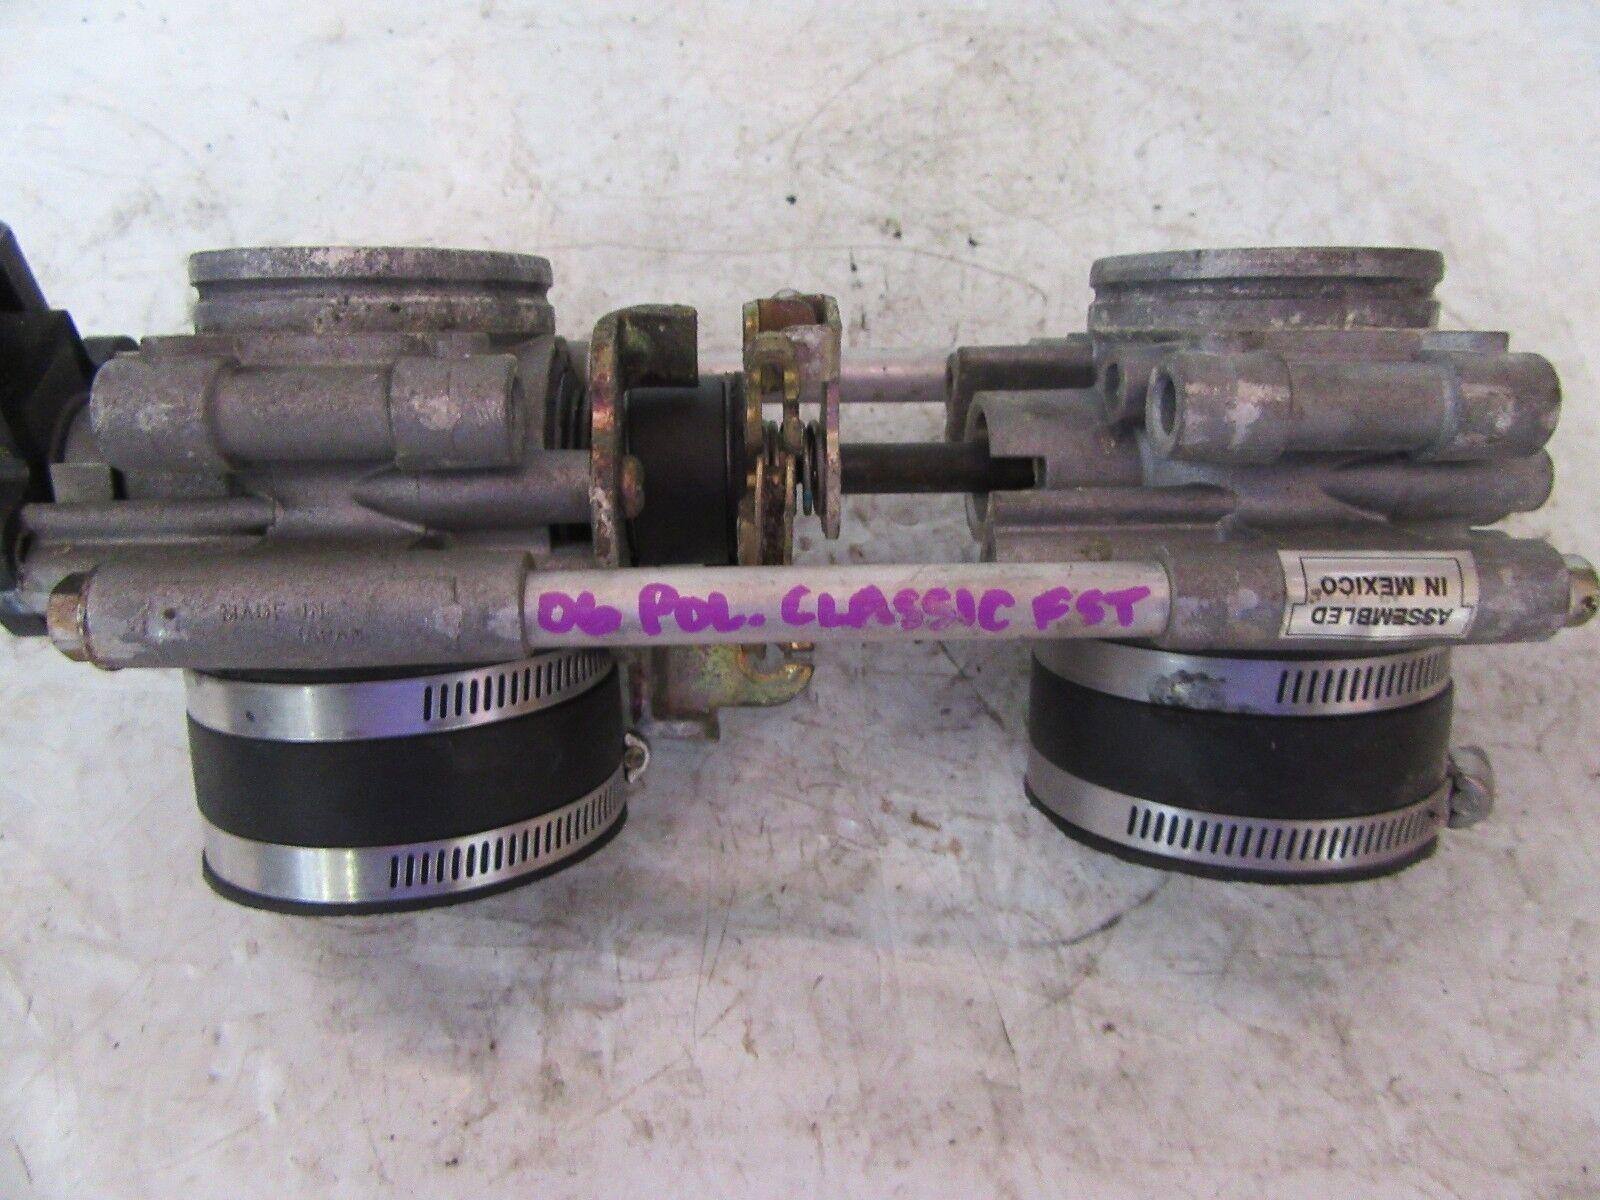 06'-10' Polaris FST Classic Throttle Body Assy. #1253519 Item #429